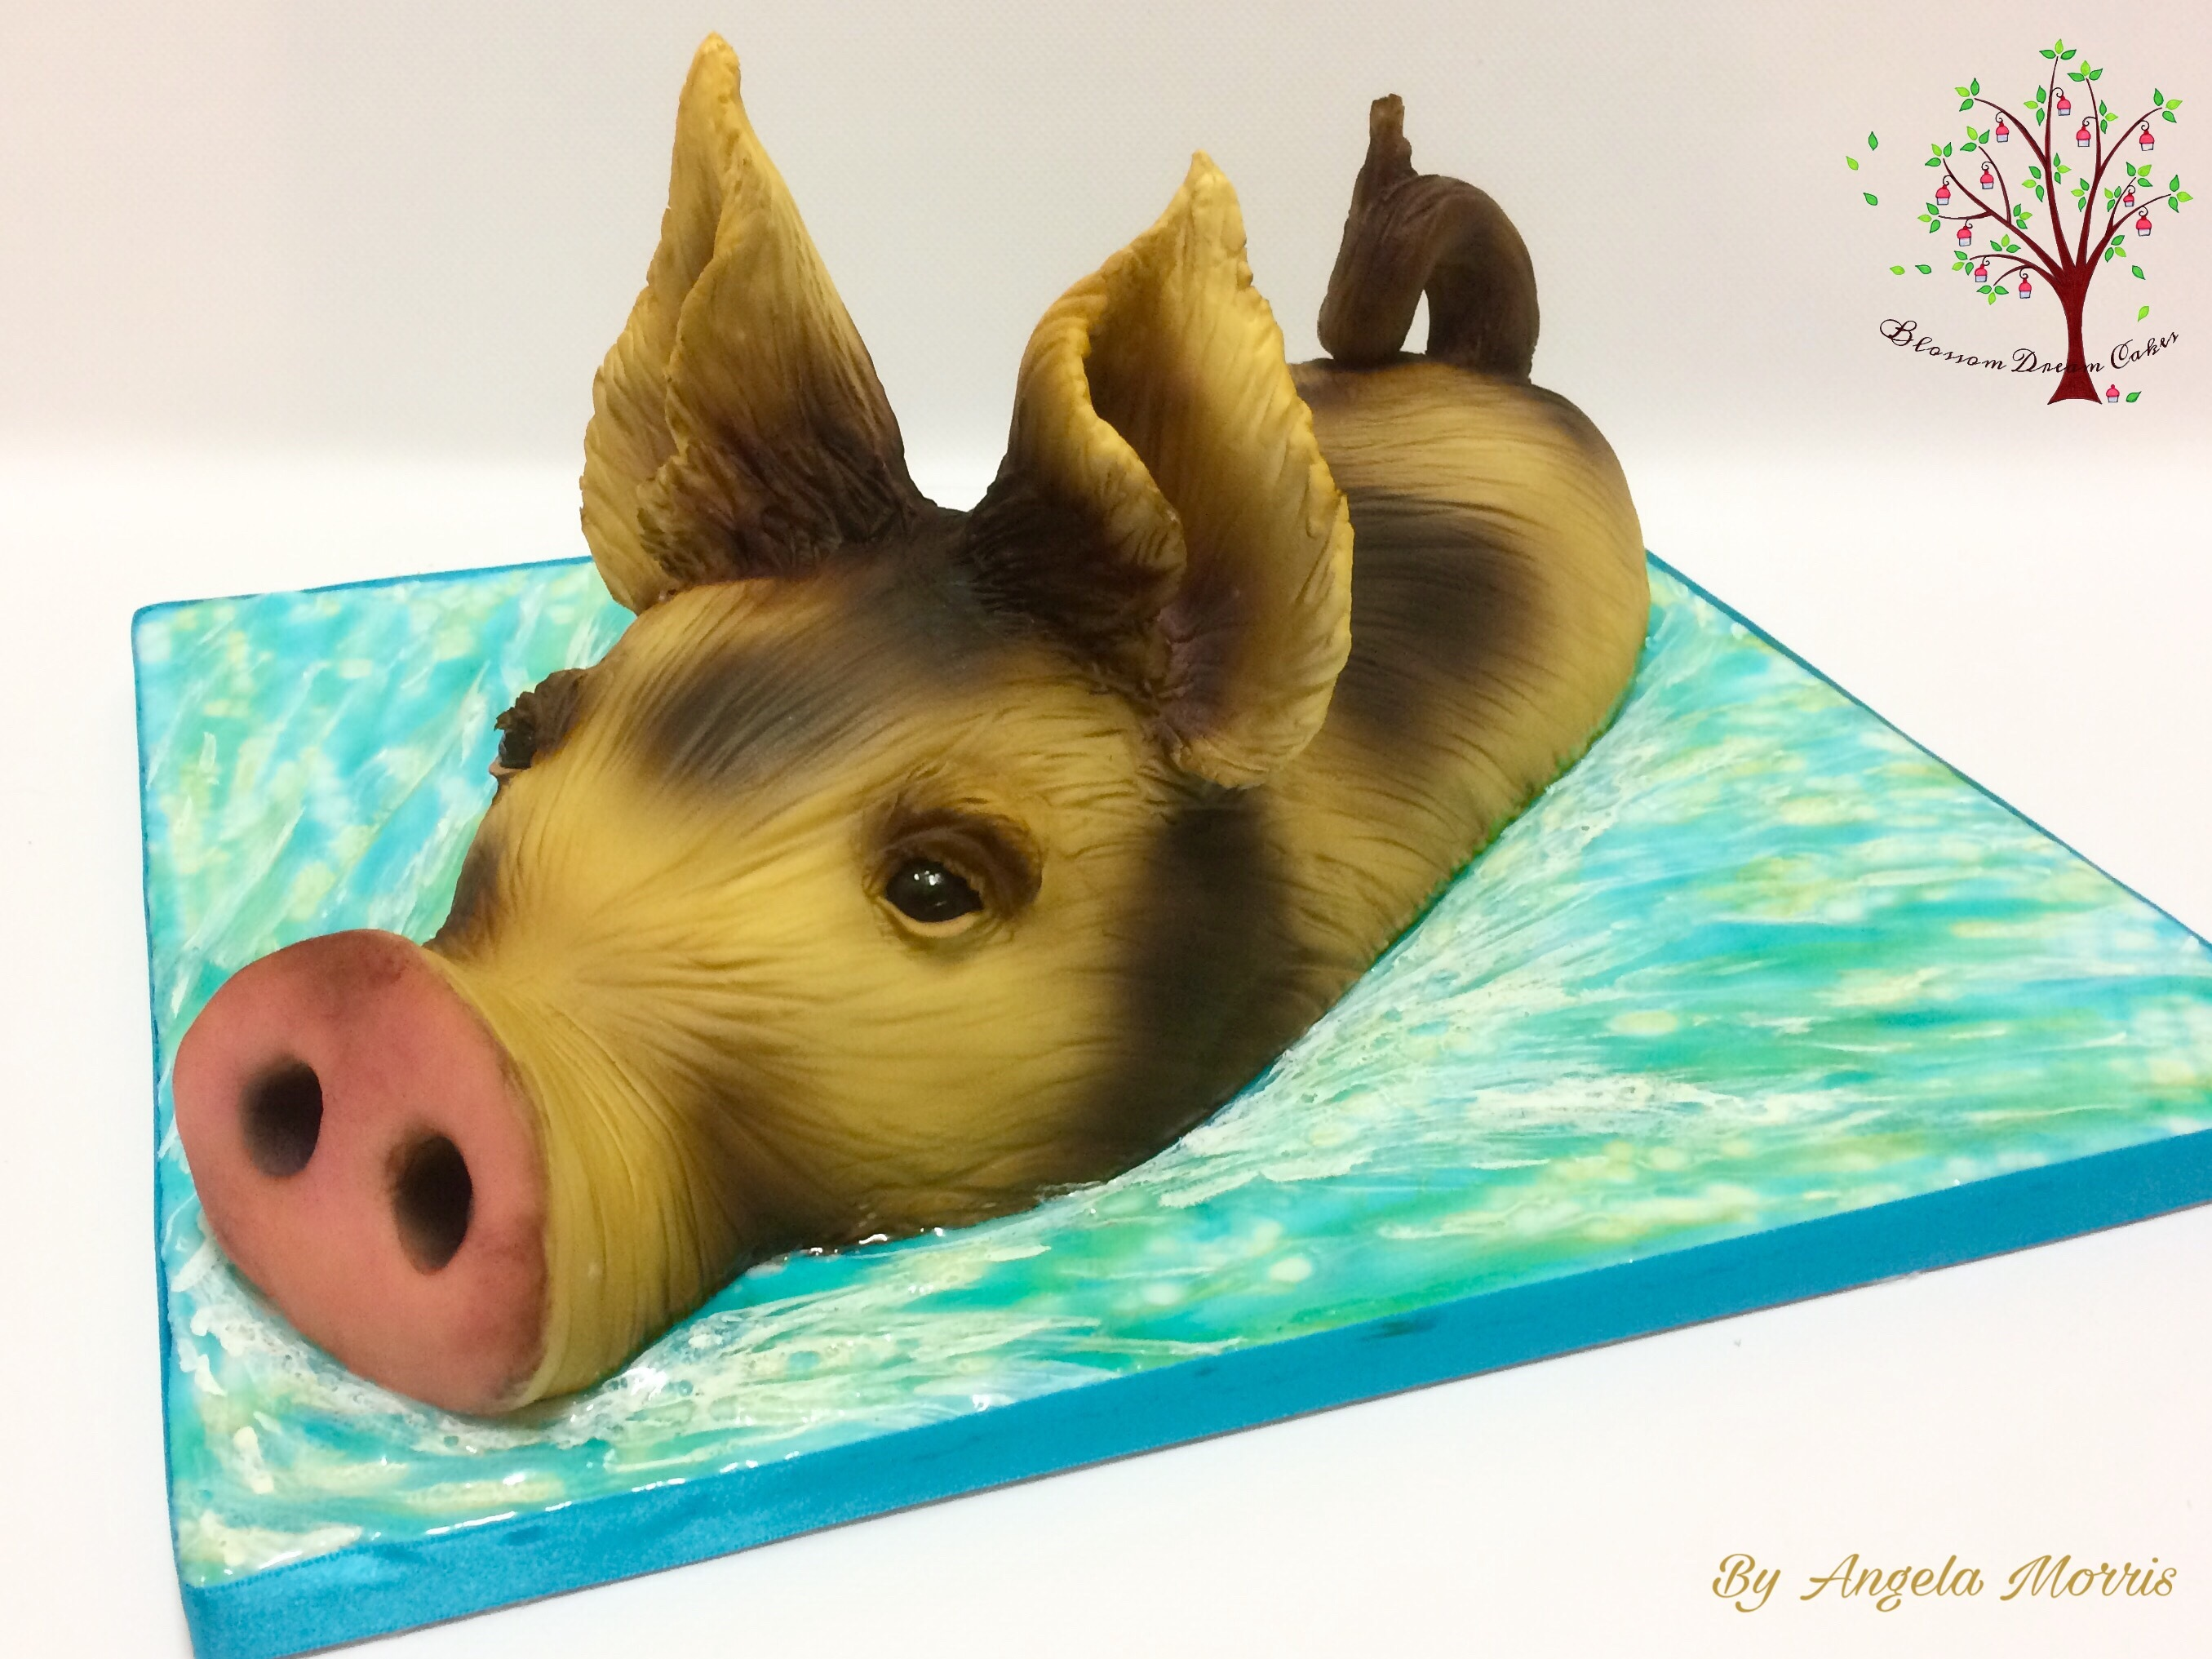 Animal-Rights-Angela-Morris-Blossom-Dream-Cakes-Pig.jpeg#asset:13713